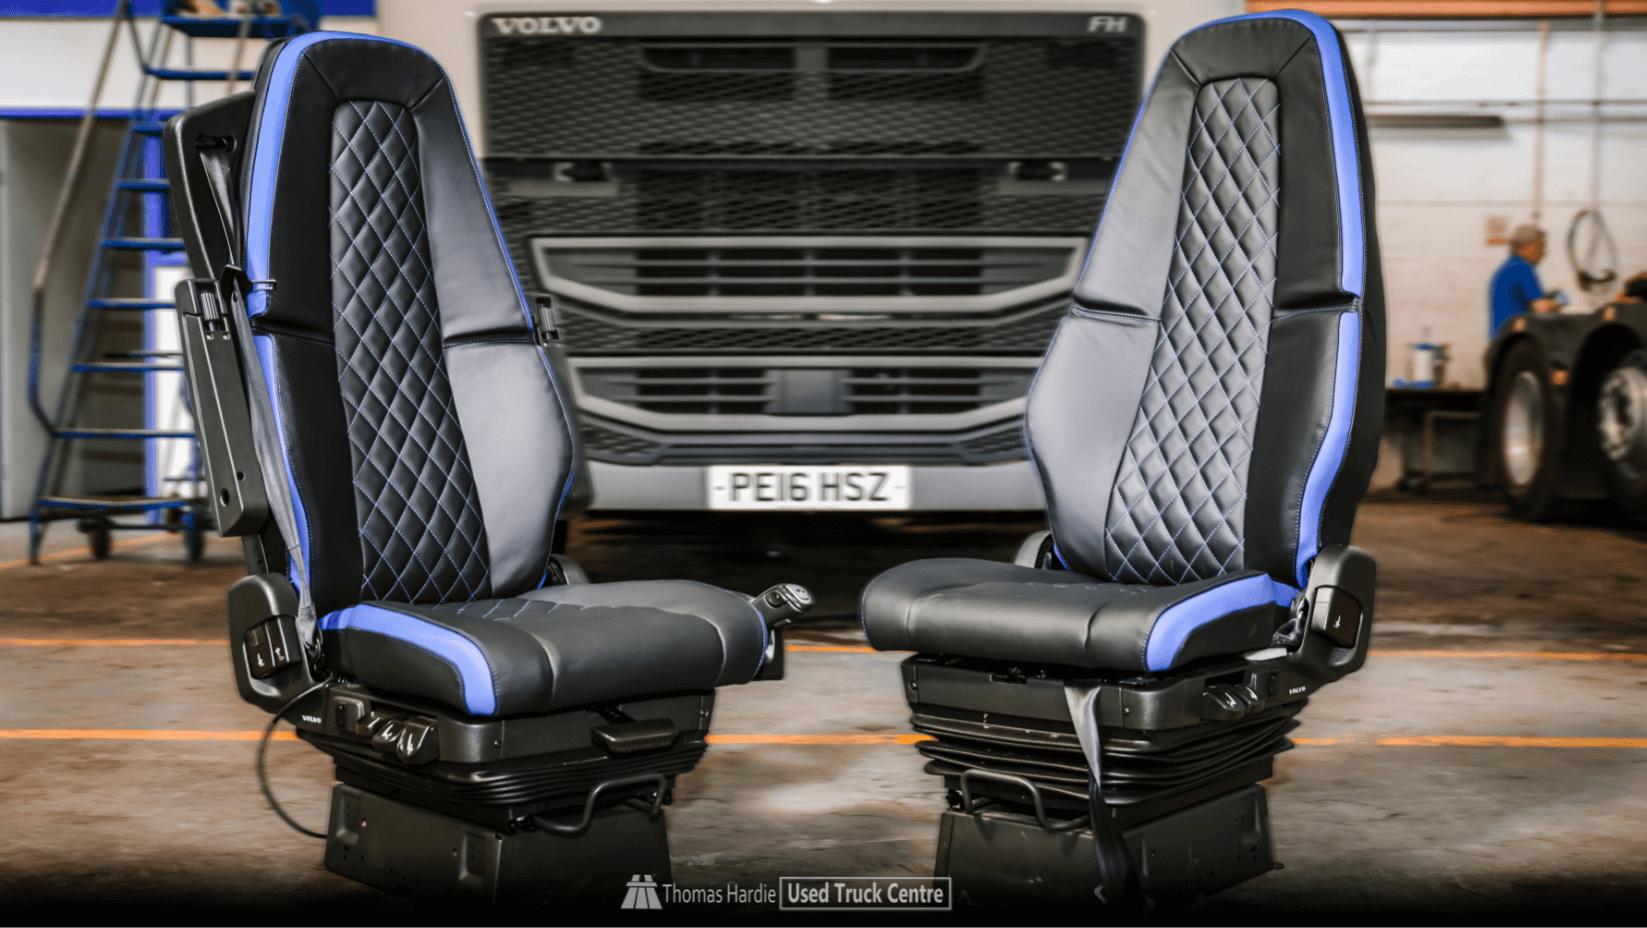 Seats - Thomas Hardie